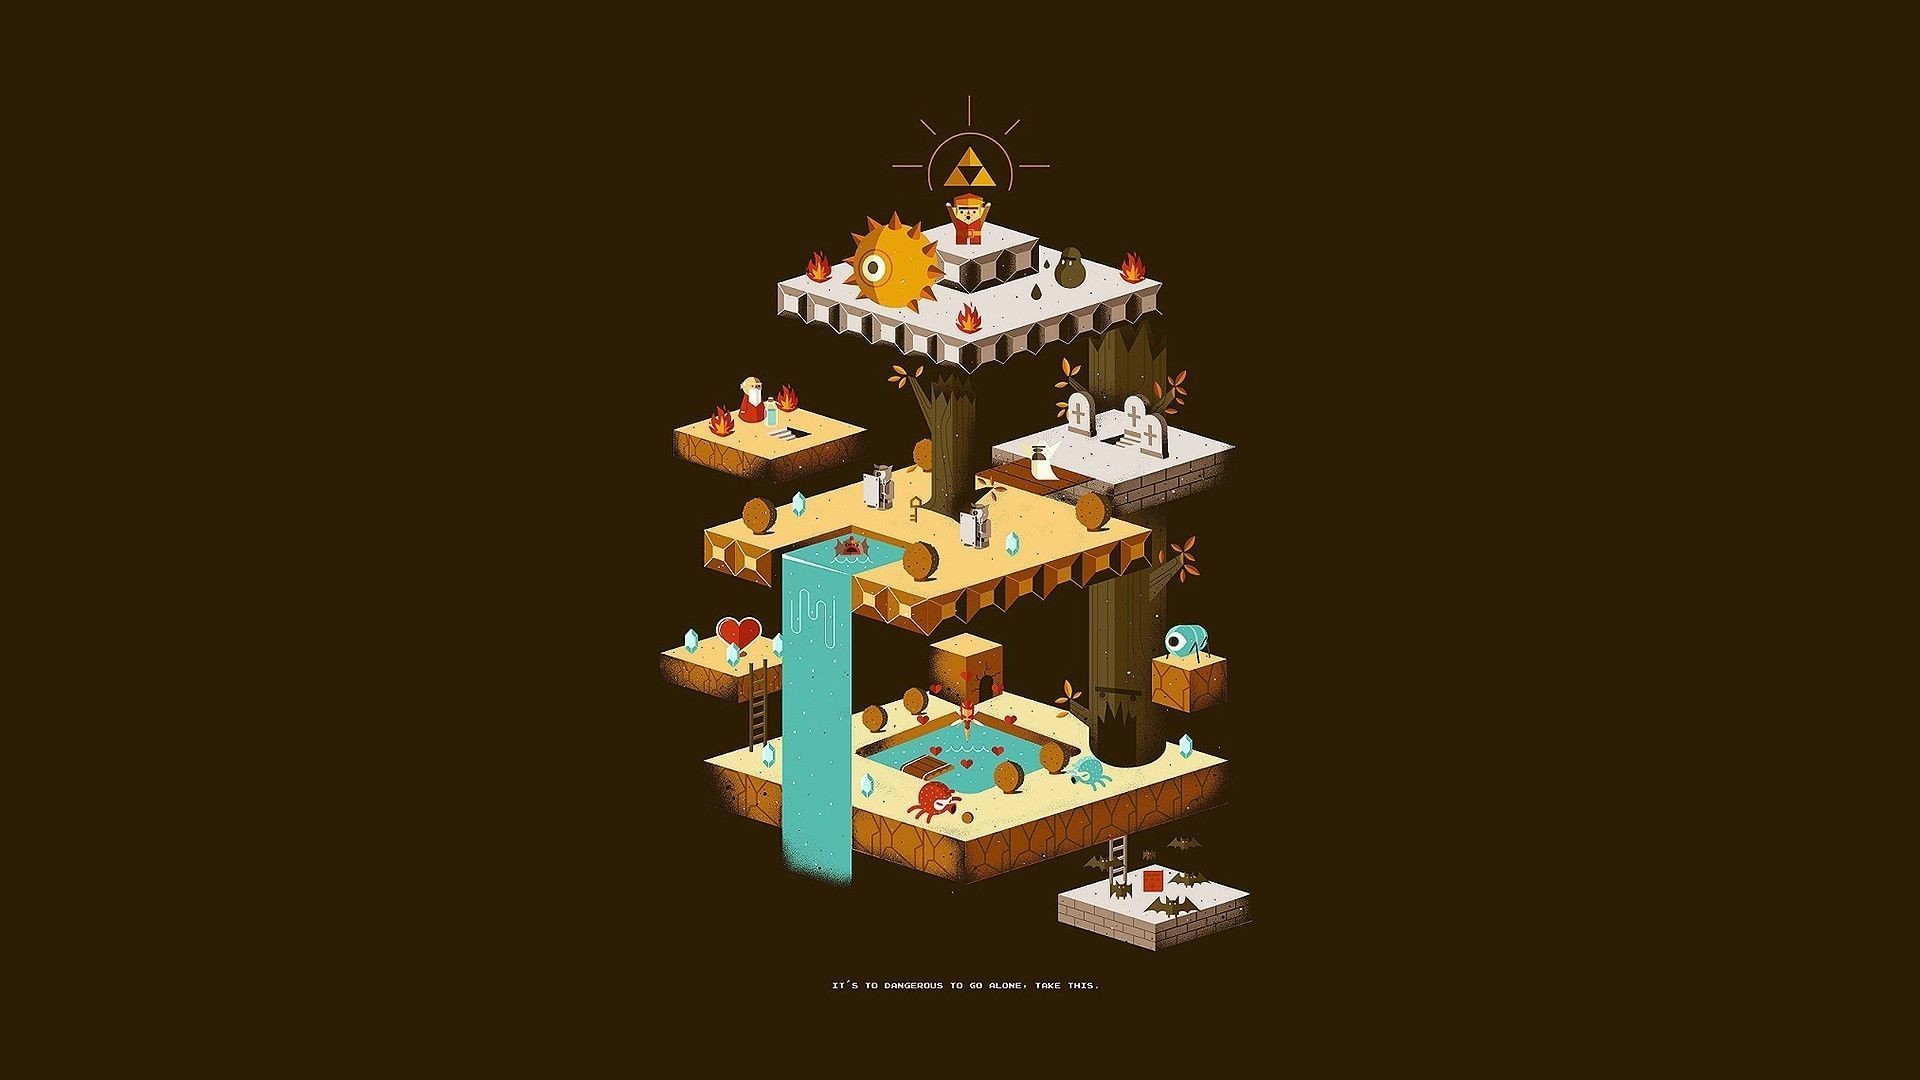 Zelda Wallpaper Hd – Widescreen HD Wallpapers